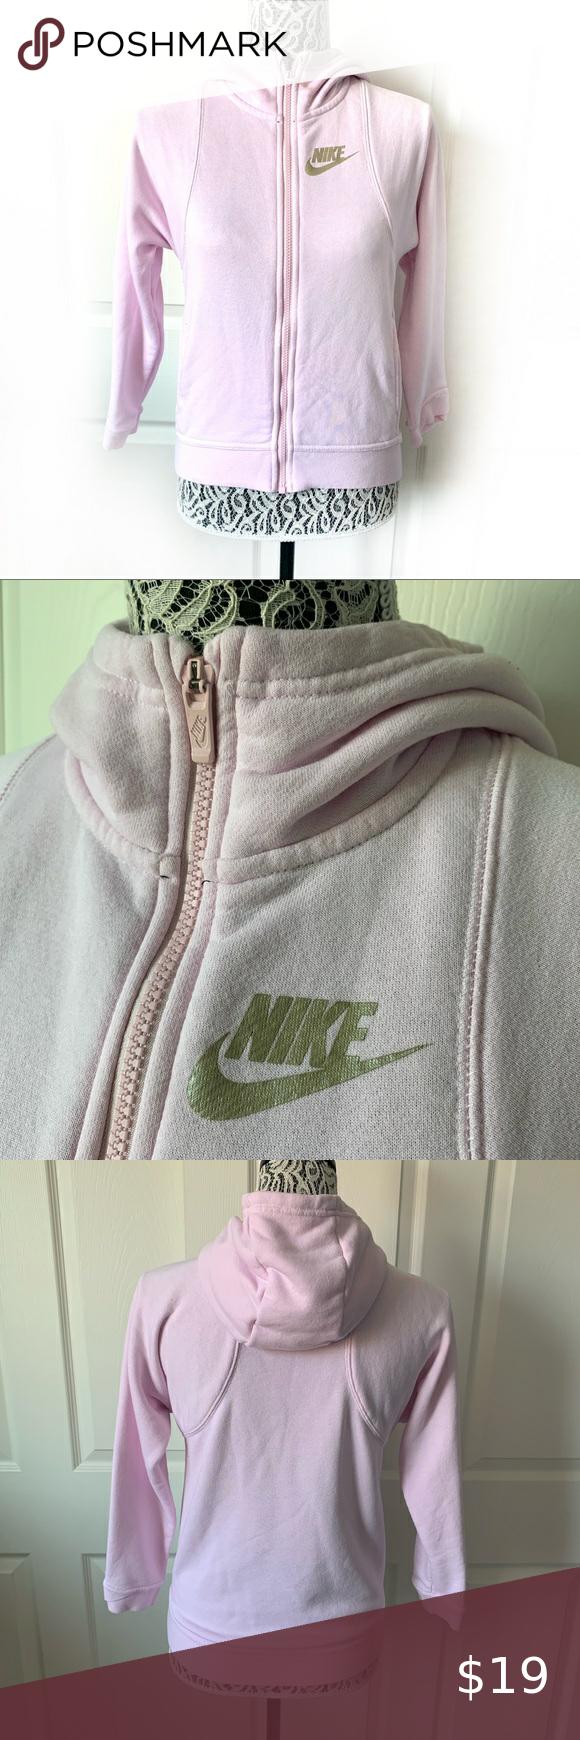 Nike Blush Pink Zip Up Hoodie Sweatshirt Medium Pink Zip Ups Sweatshirts Hoodie Sweatshirts [ 1740 x 580 Pixel ]